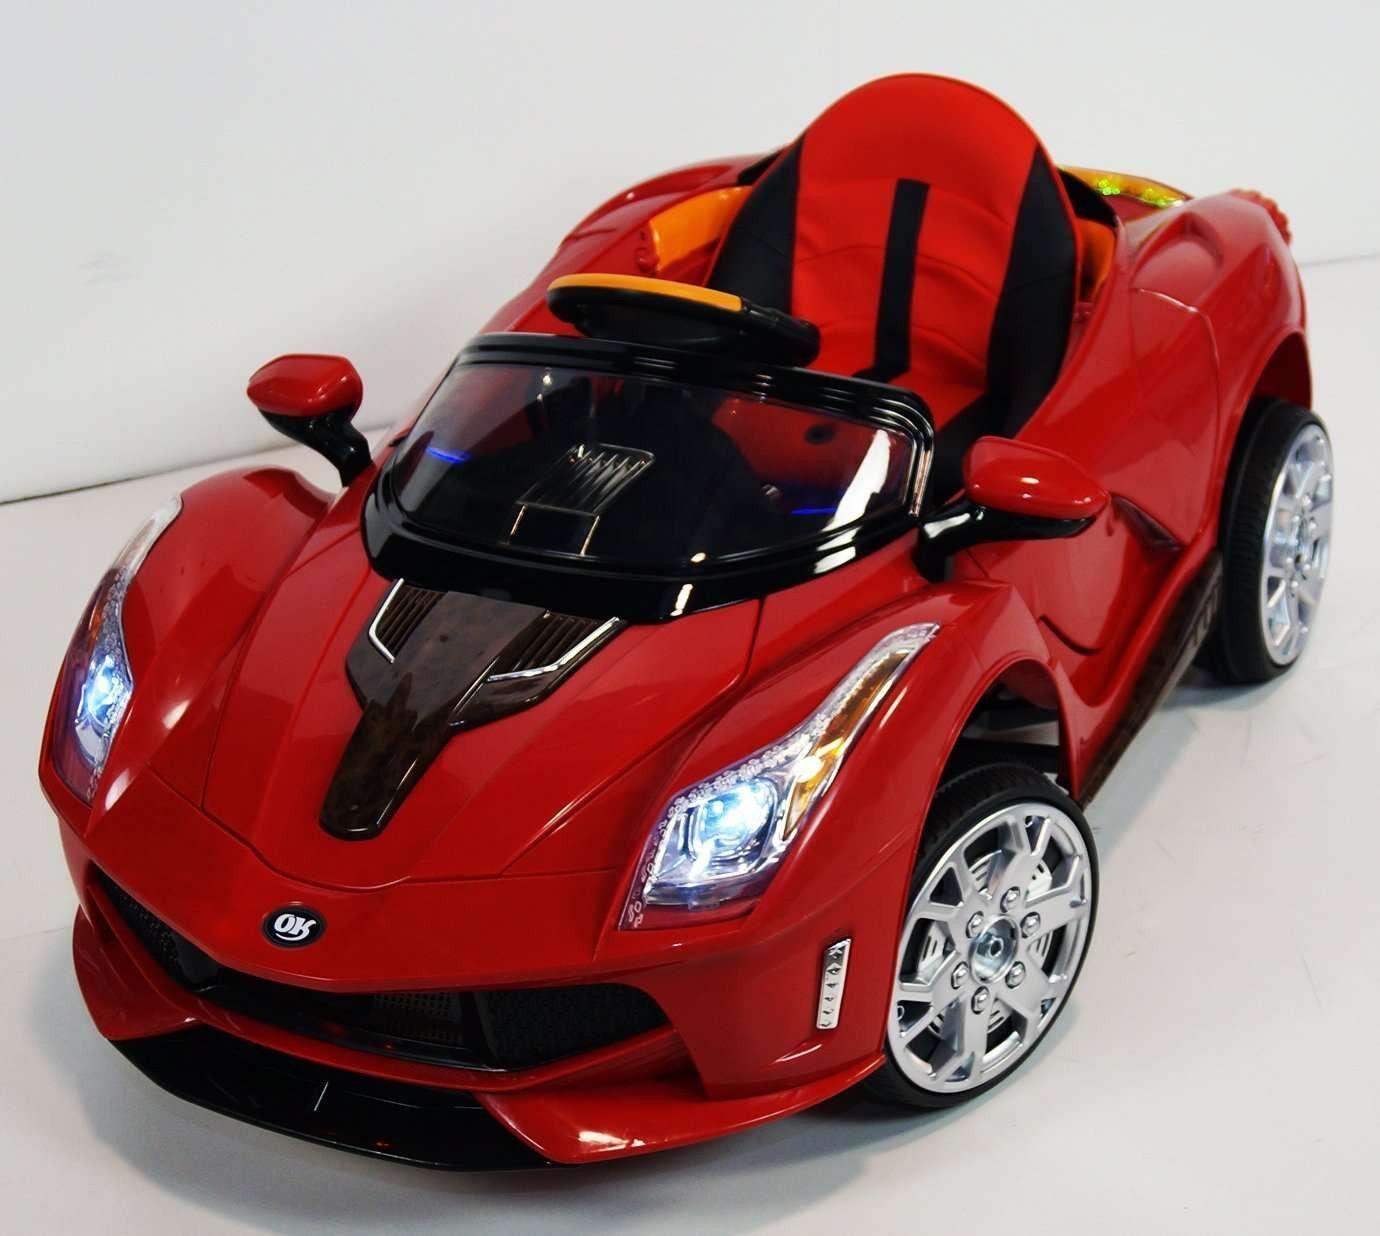 Mclaren P1 12v Power Wheel Ride On Super Car Parental: Super Ferrari Style Car